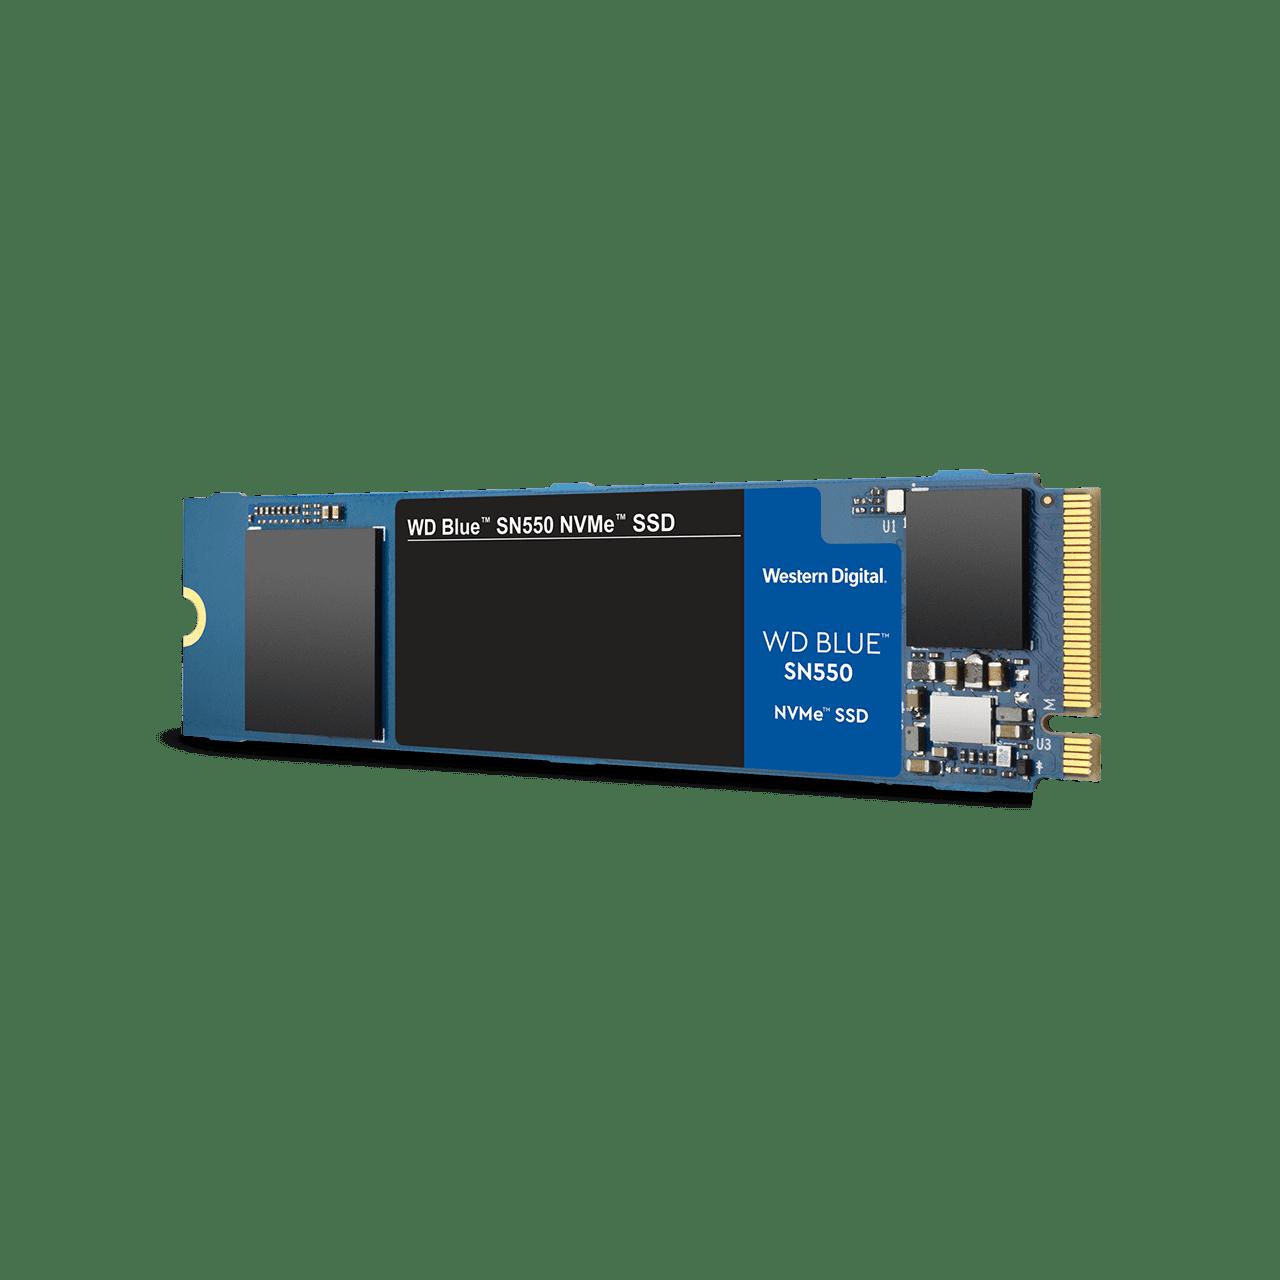 WD Western Digital M.2 PCIE NVME Blue SN550 SSD 250GB (WDS250G2B0C) / 500GB (WDS500G2B0C) / 1TB (WDS100T2B0C)